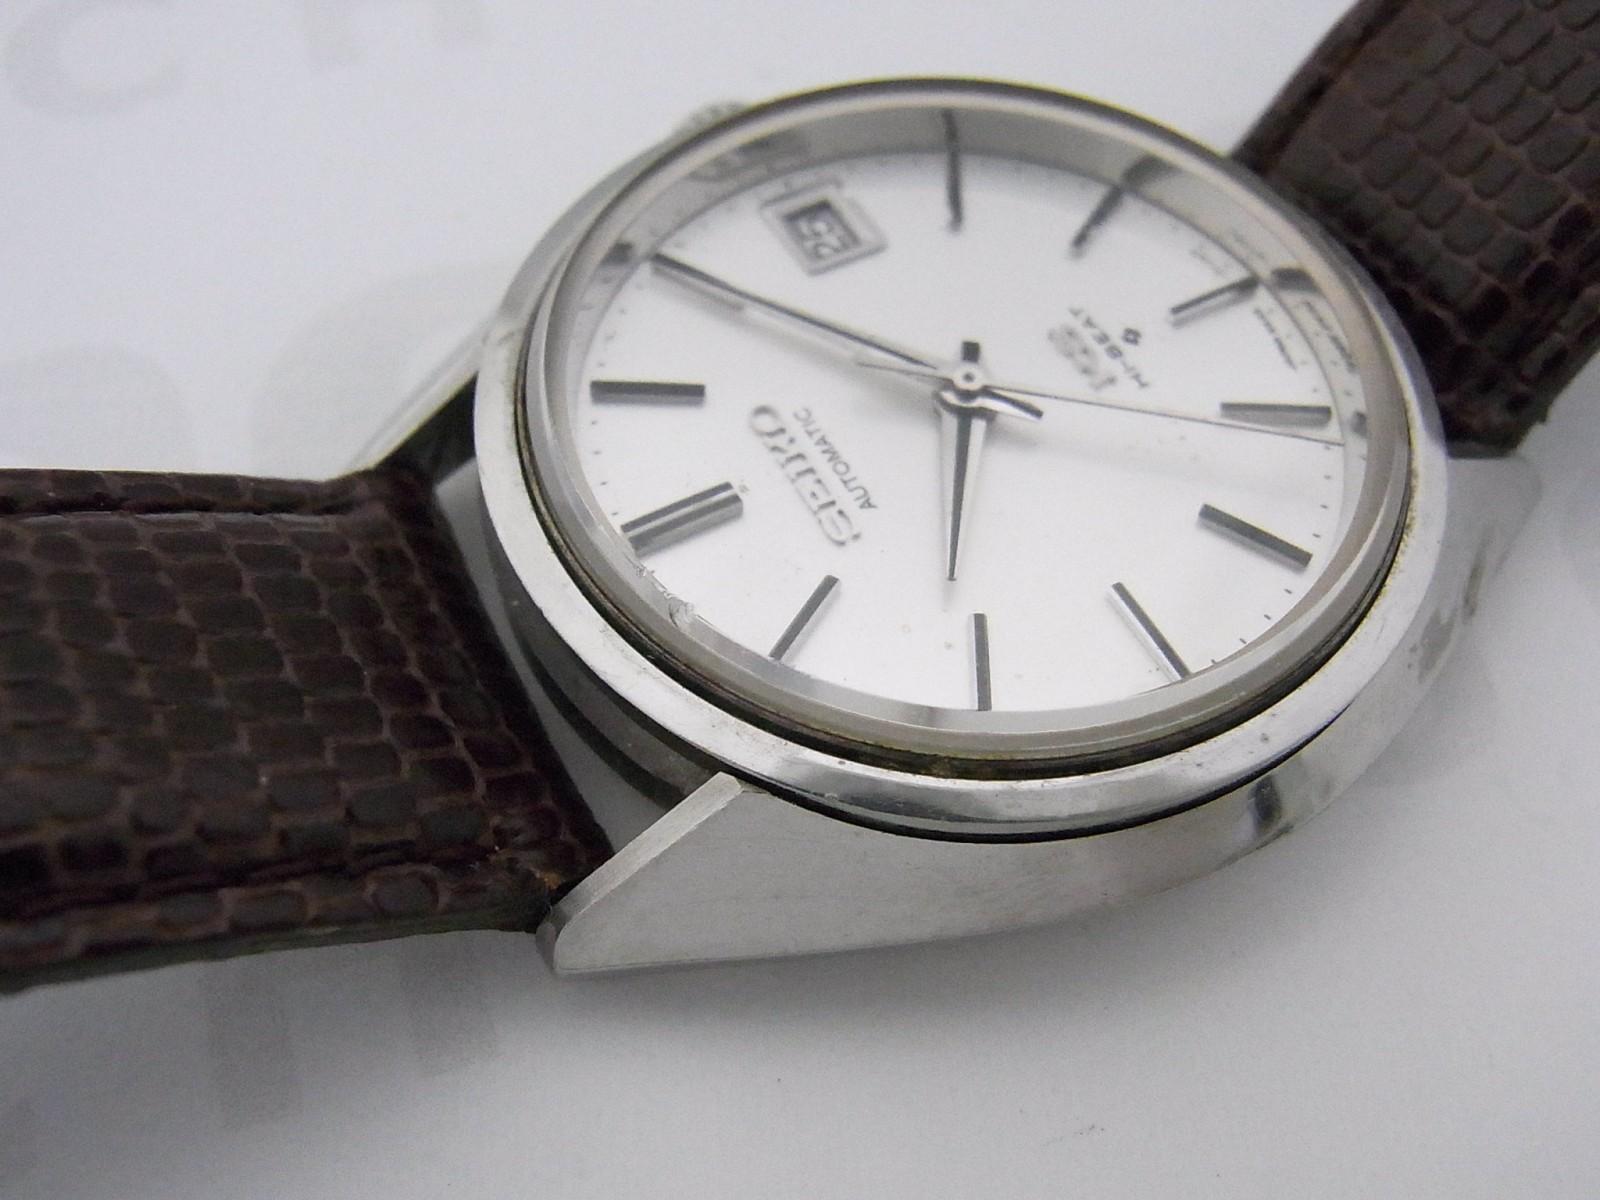 Pre-owned Seiko king seiko hi-beat 5625-7110 watch (£8) for sale ...